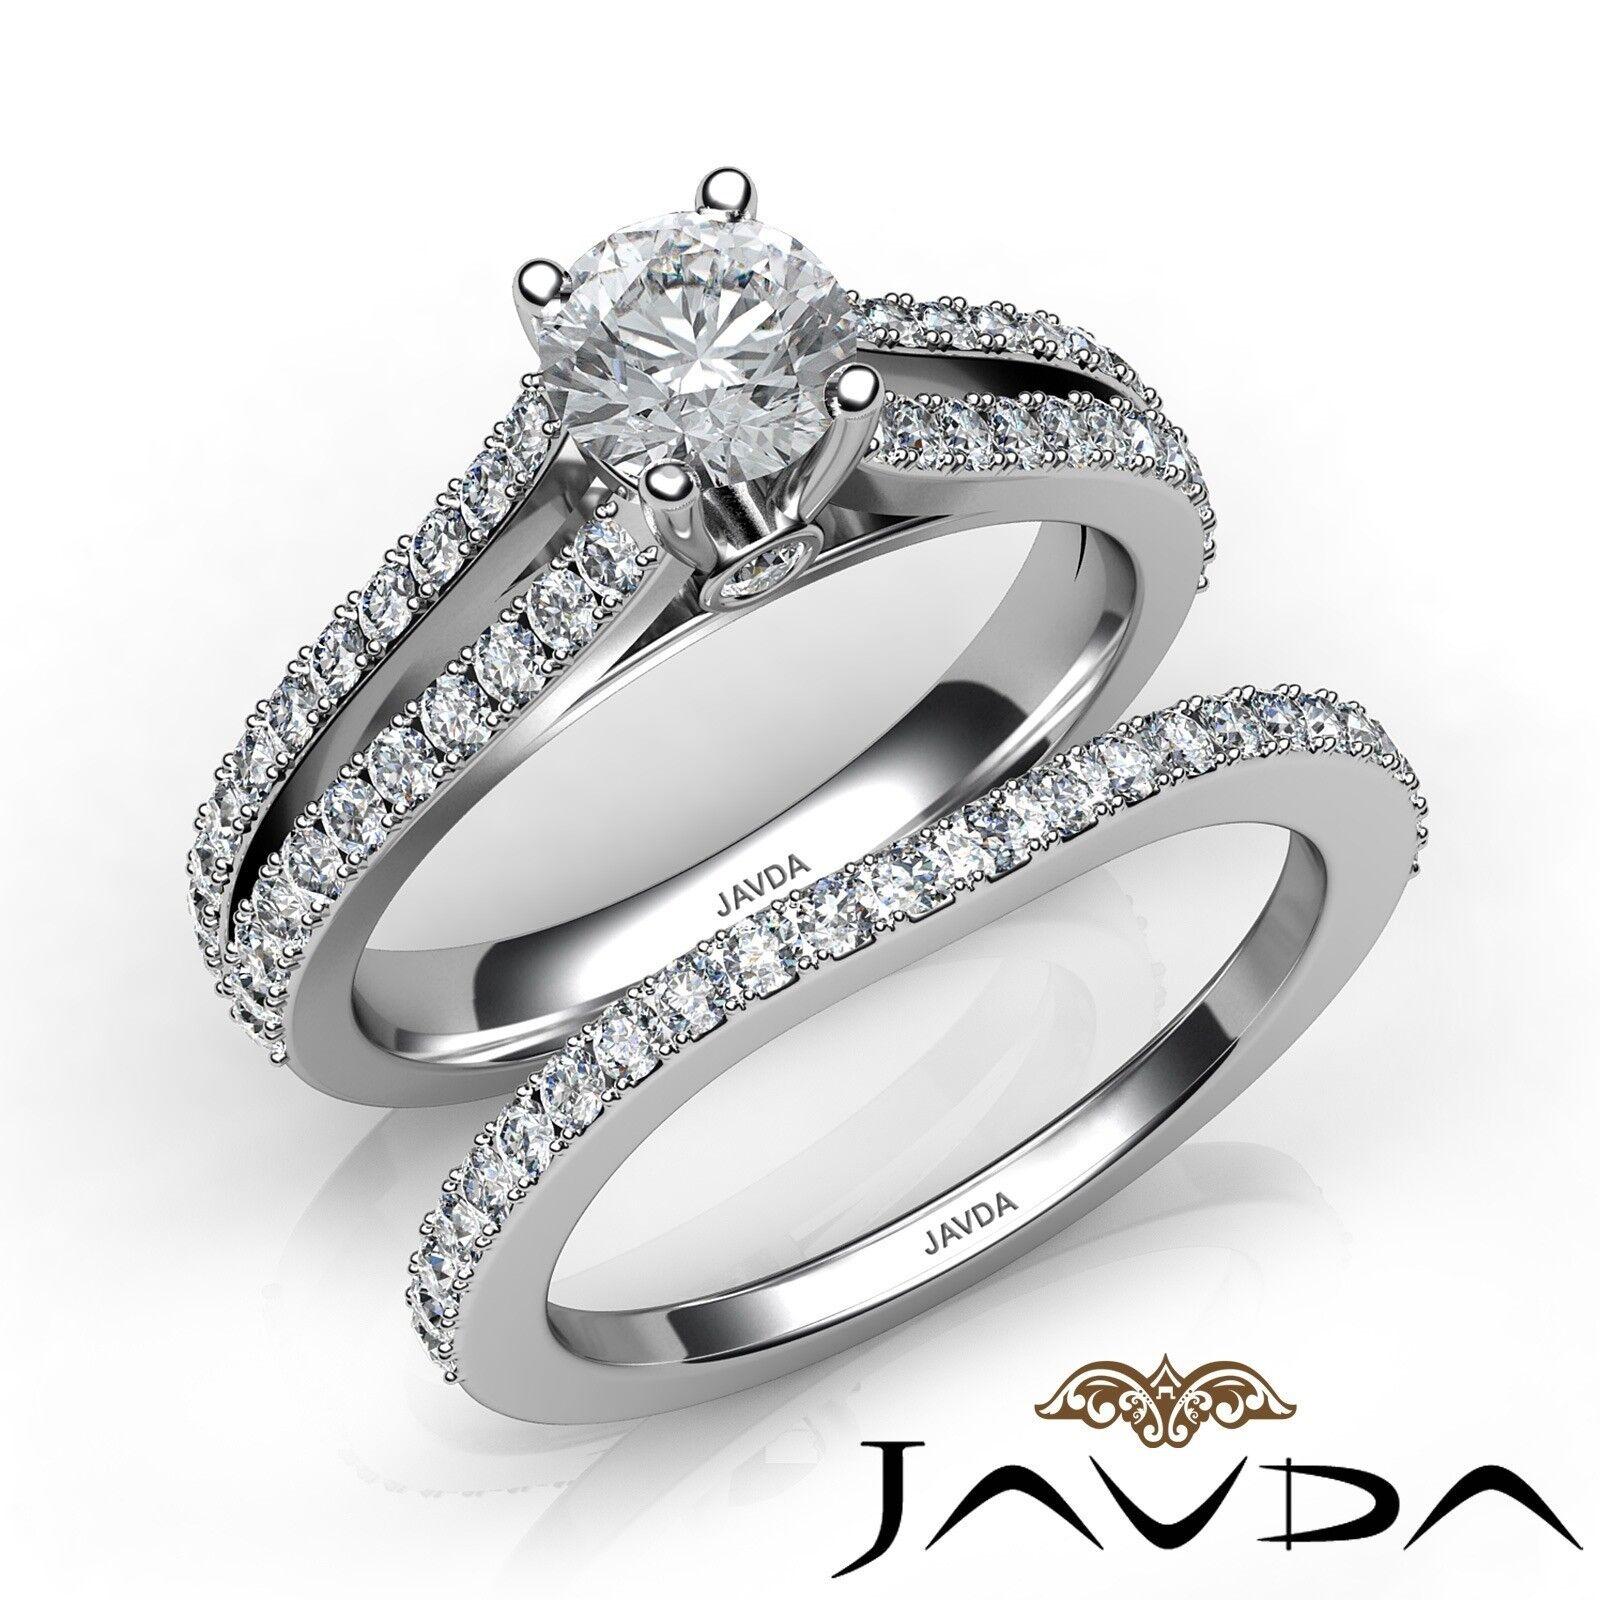 1.76ctw Peekaboo Wedding Bridal Round Diamond Engagement Ring GIA H-VVS1 W Gold